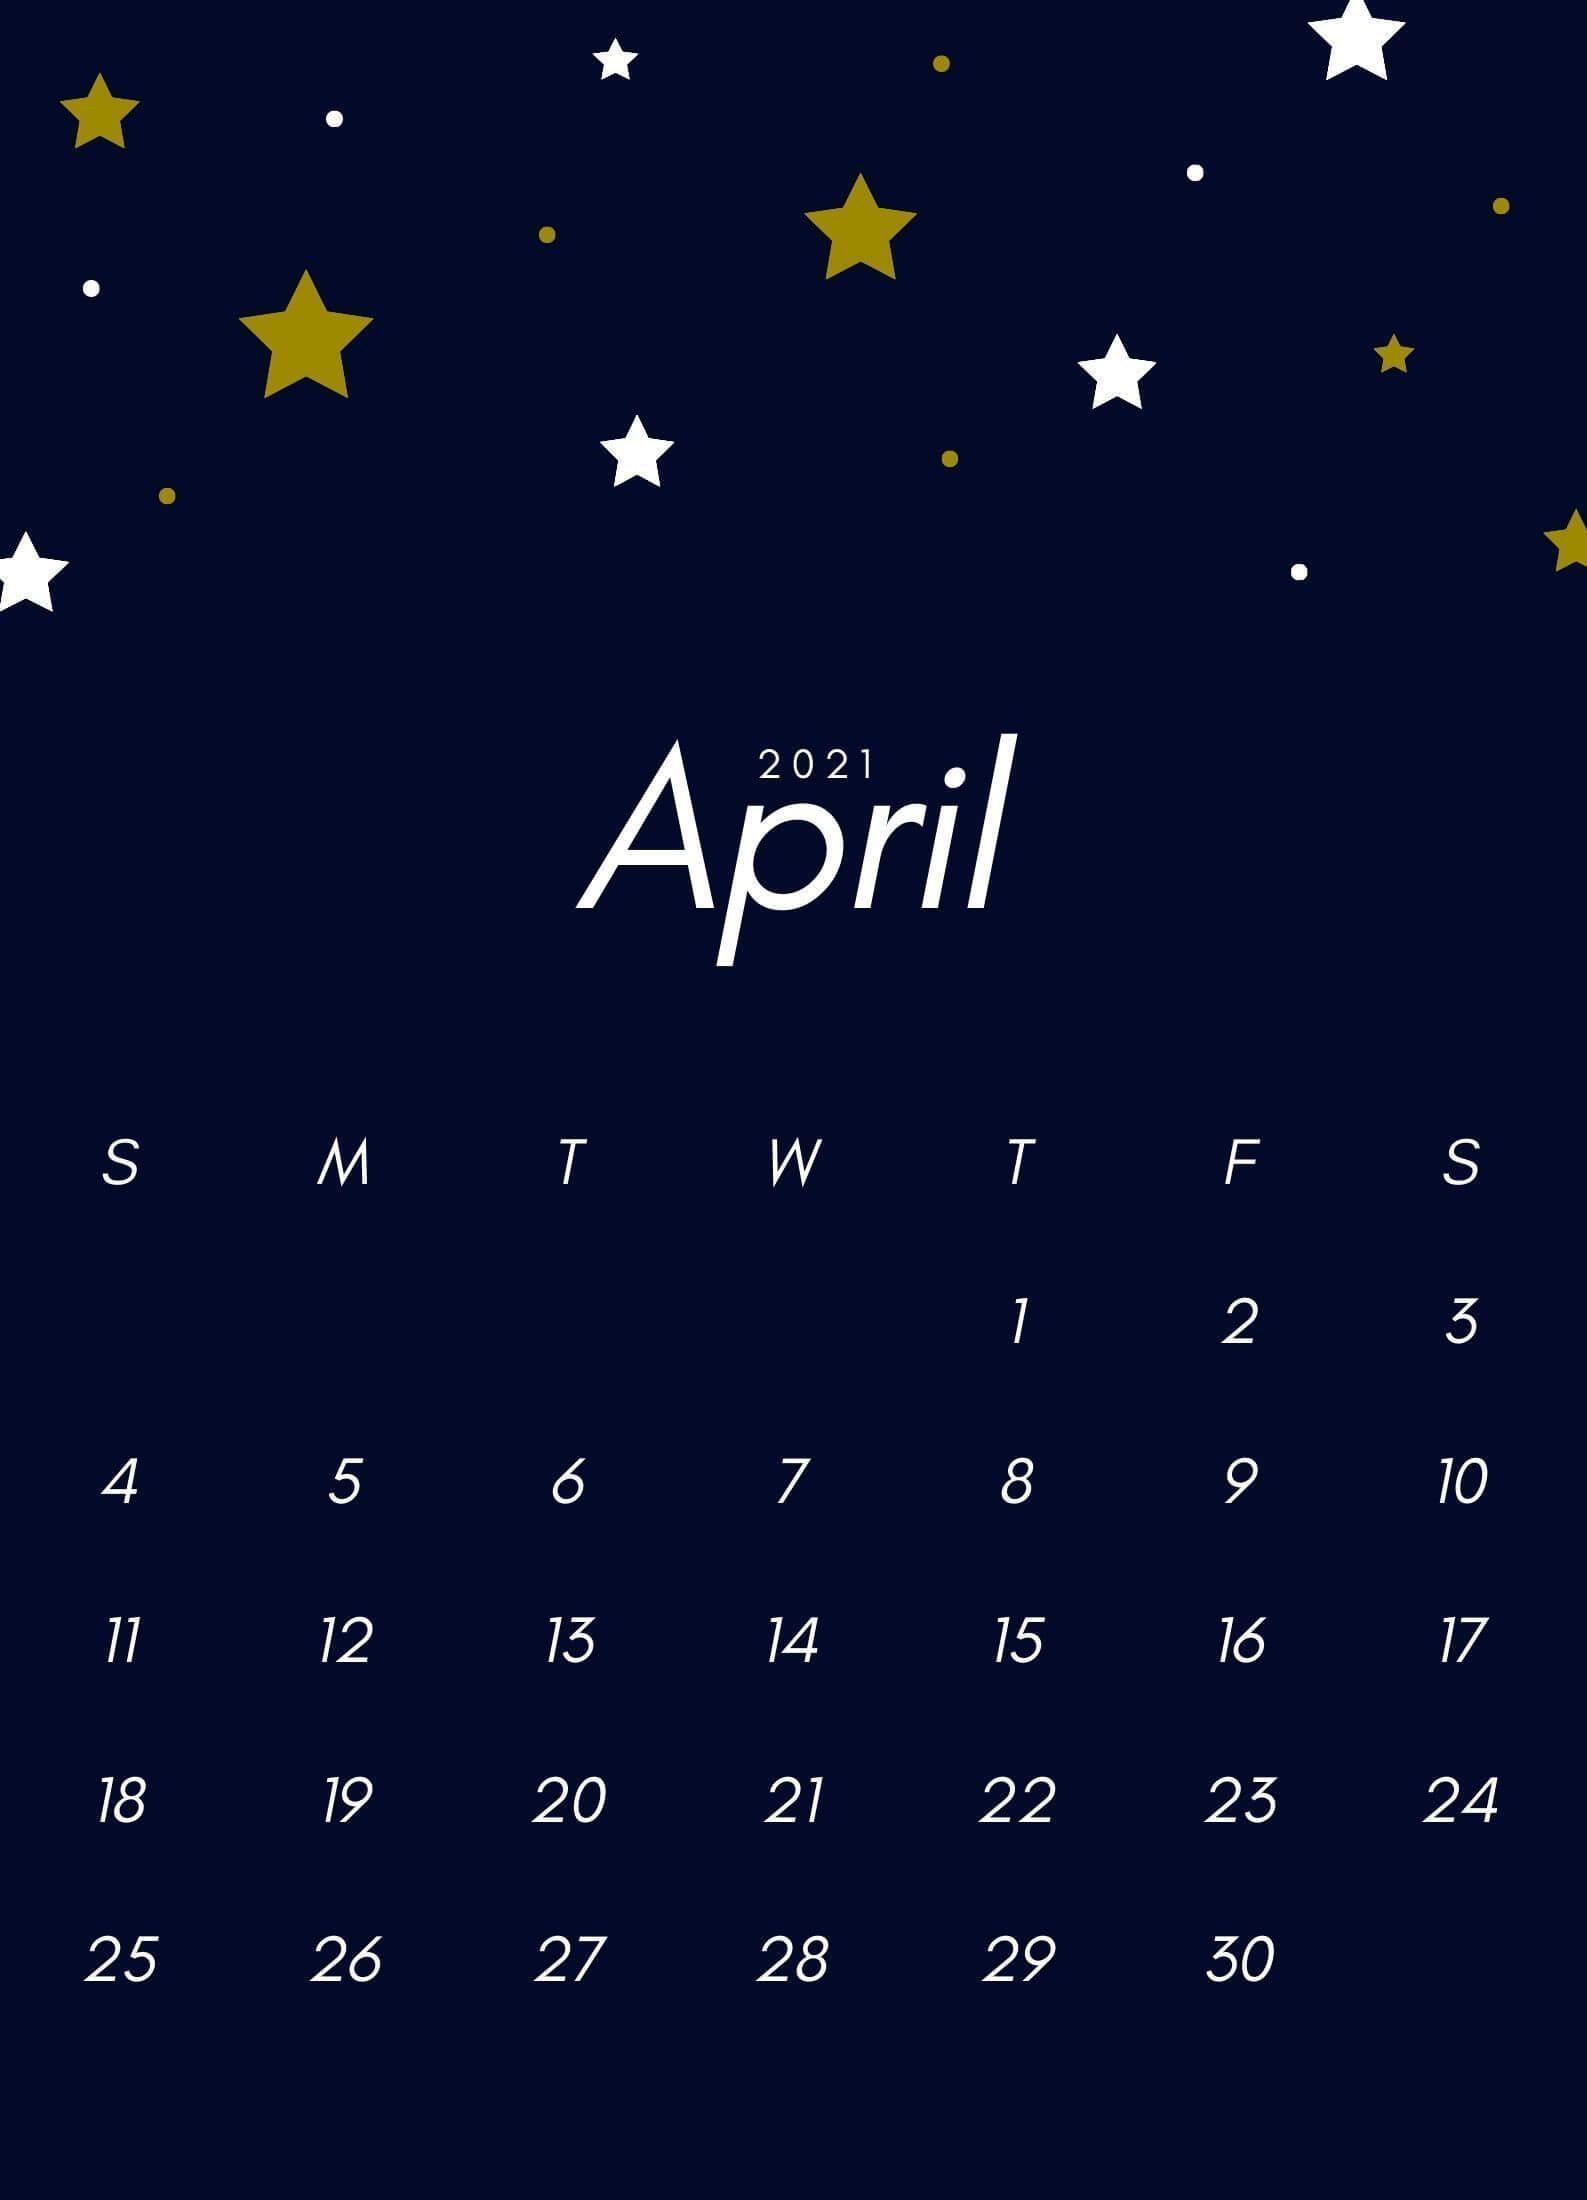 April 2021 iPhone Calendar Wallpaper